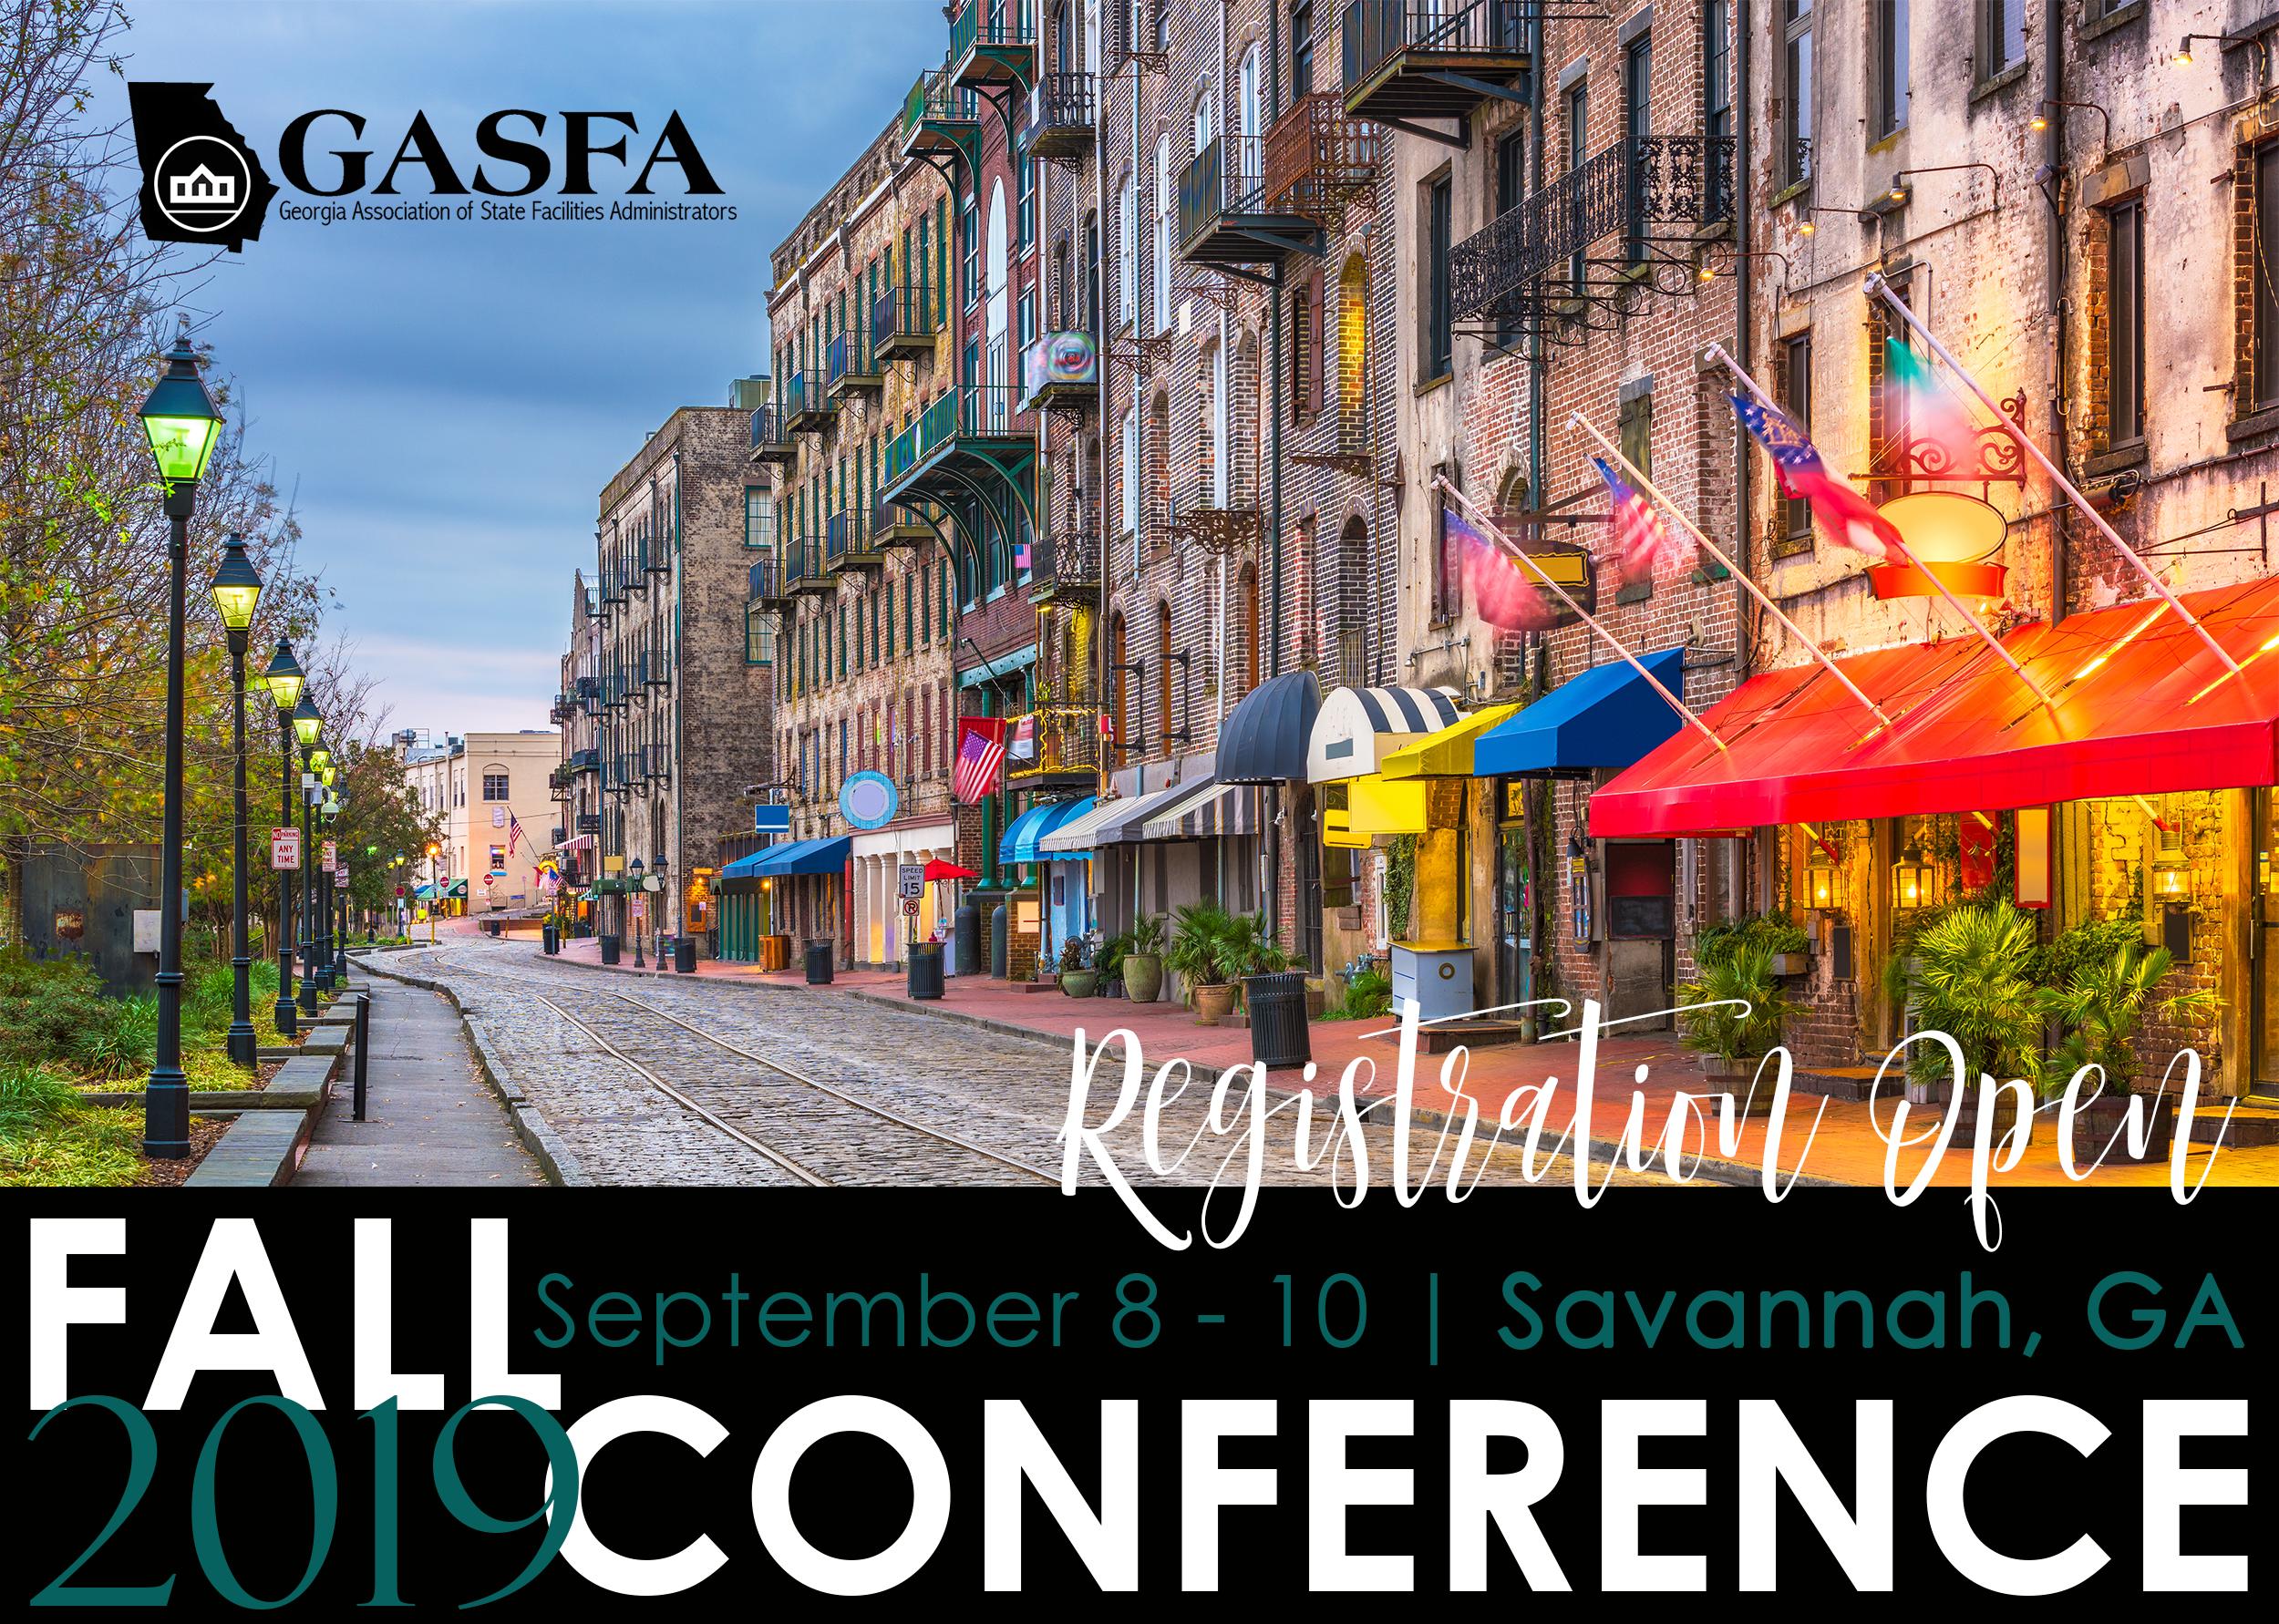 Fall 2019 GASFA reg-open